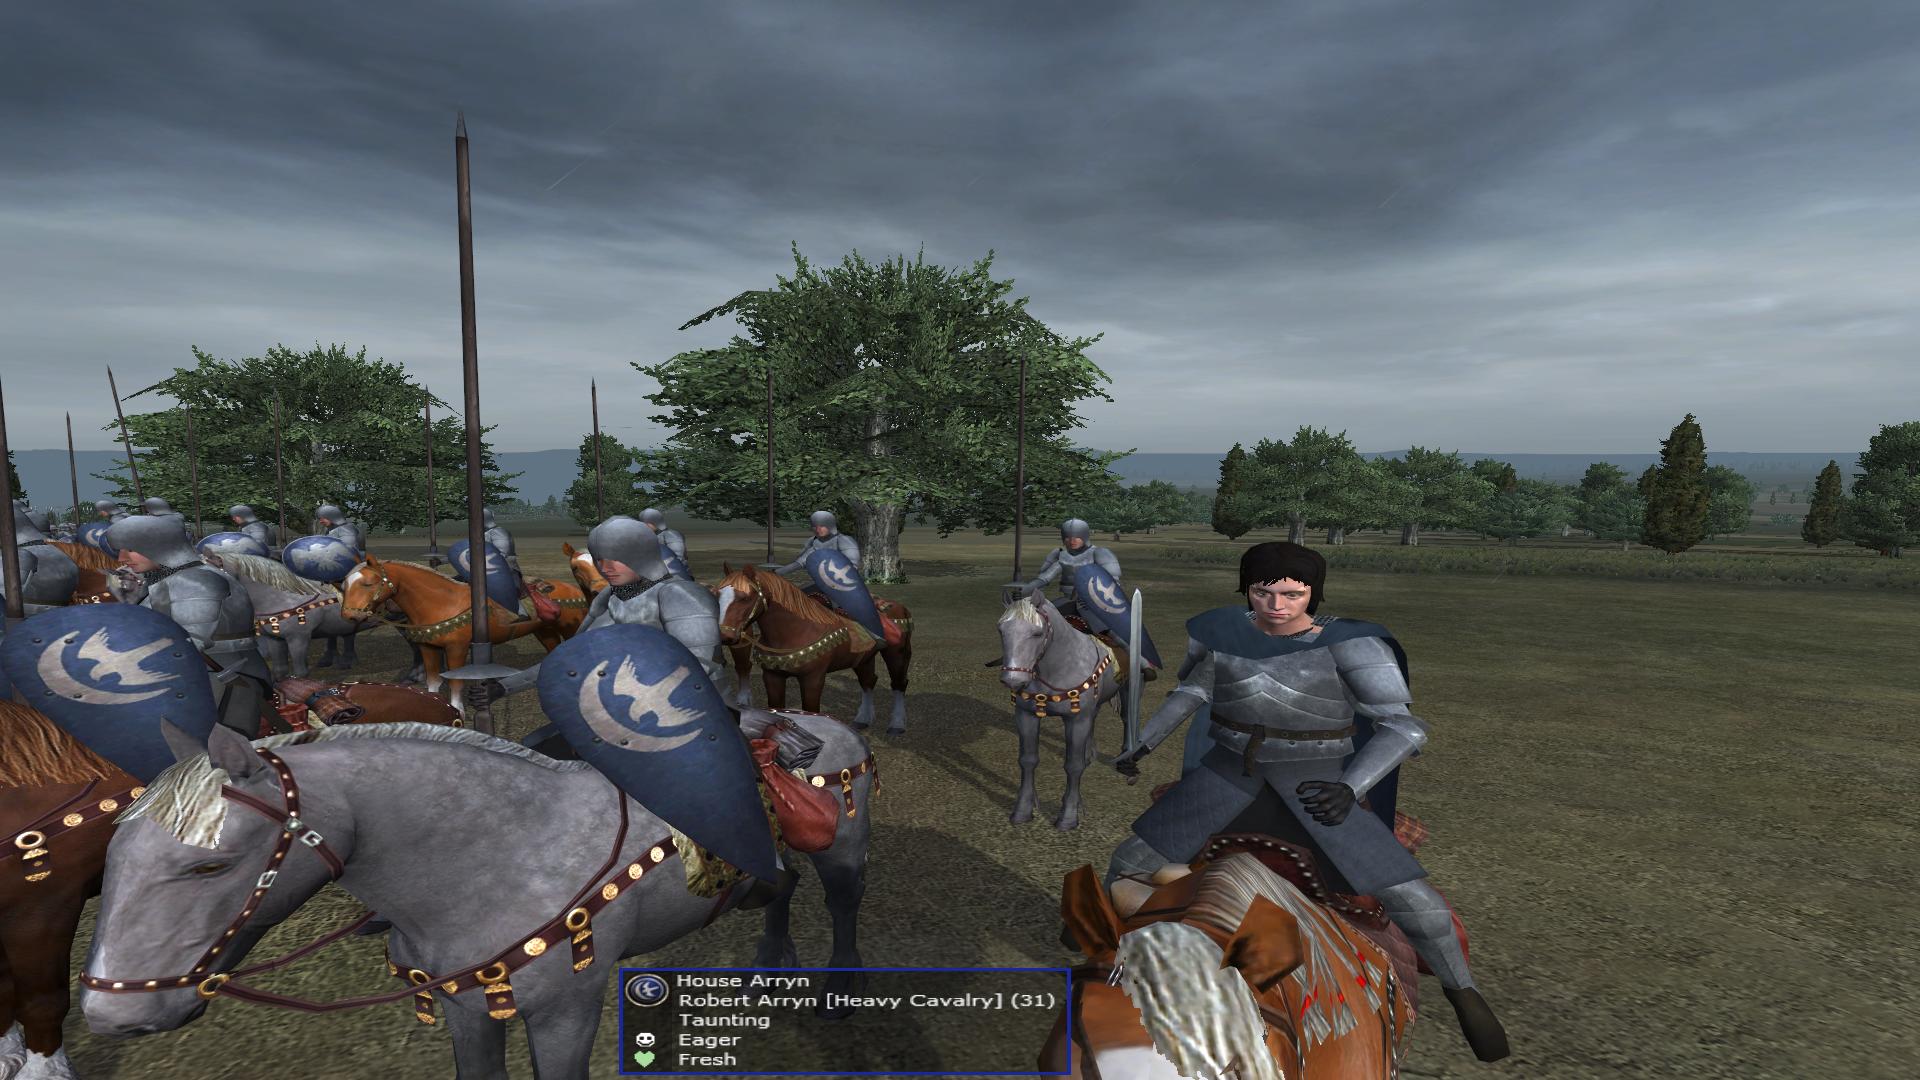 Robert Arryn, the leader of House Arryn has been added!